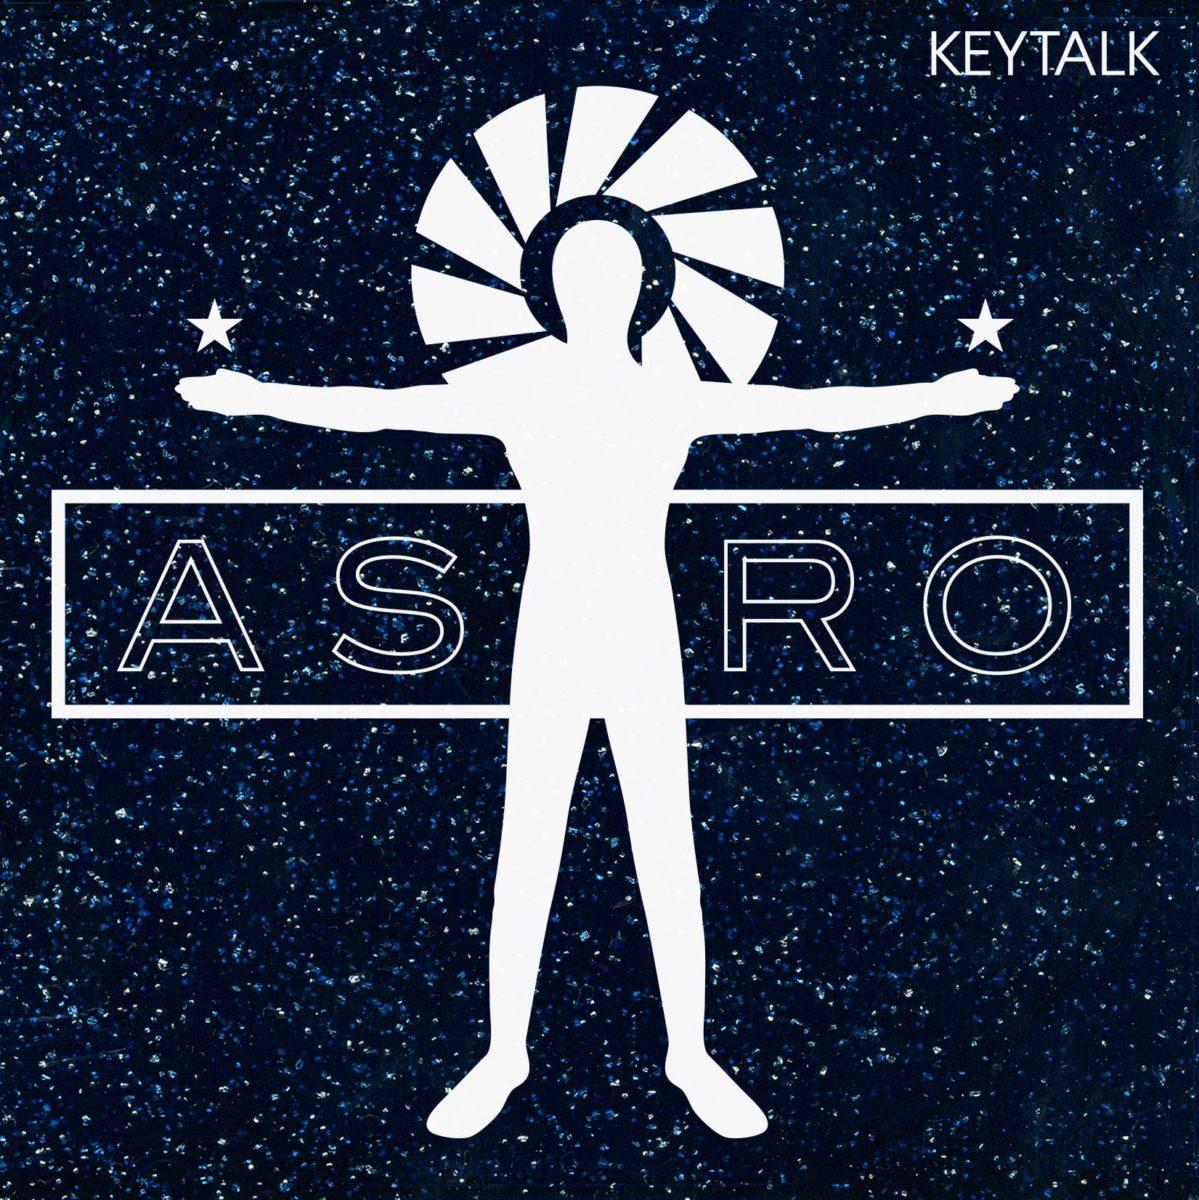 KEYTALK『ASTRO』 / CDジャケットデザイン